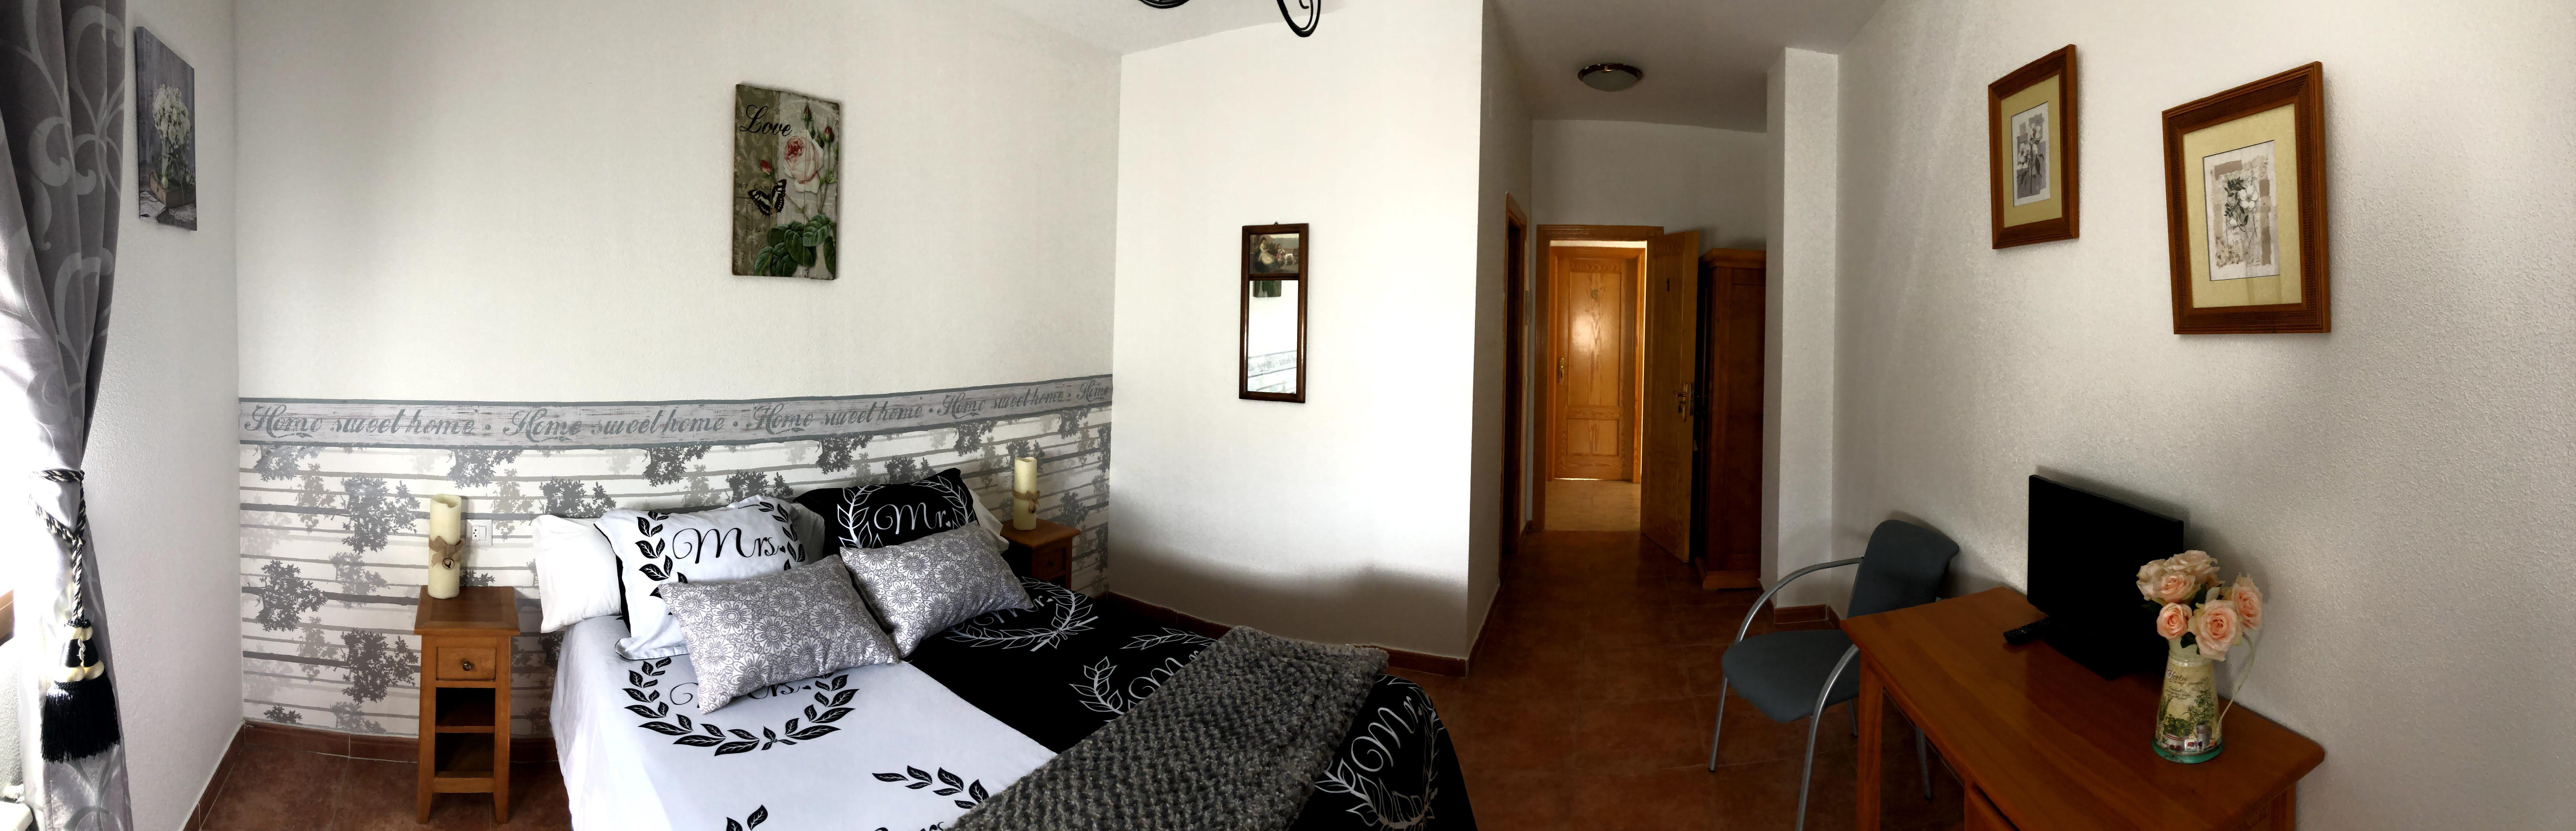 habitacion1-1